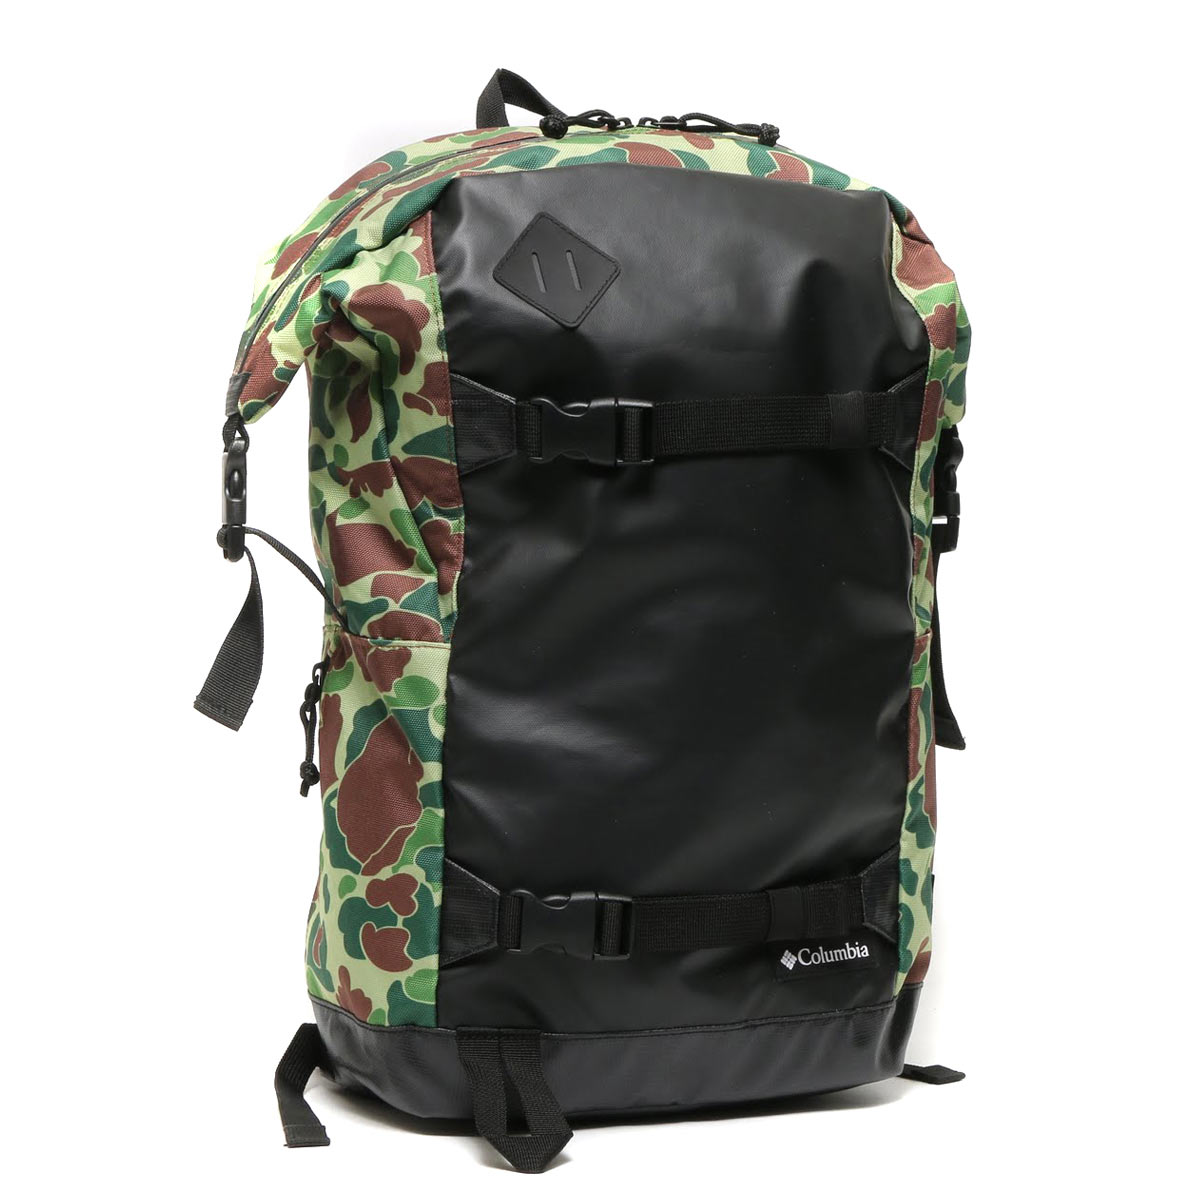 Columbia ATMOS LAB Third Bluff(TM) Special Backpack (コロンビア アトモスラボ サードブラフ(TM) スペシャル バックパック )ELM CAMO【バックパック】17SS-S